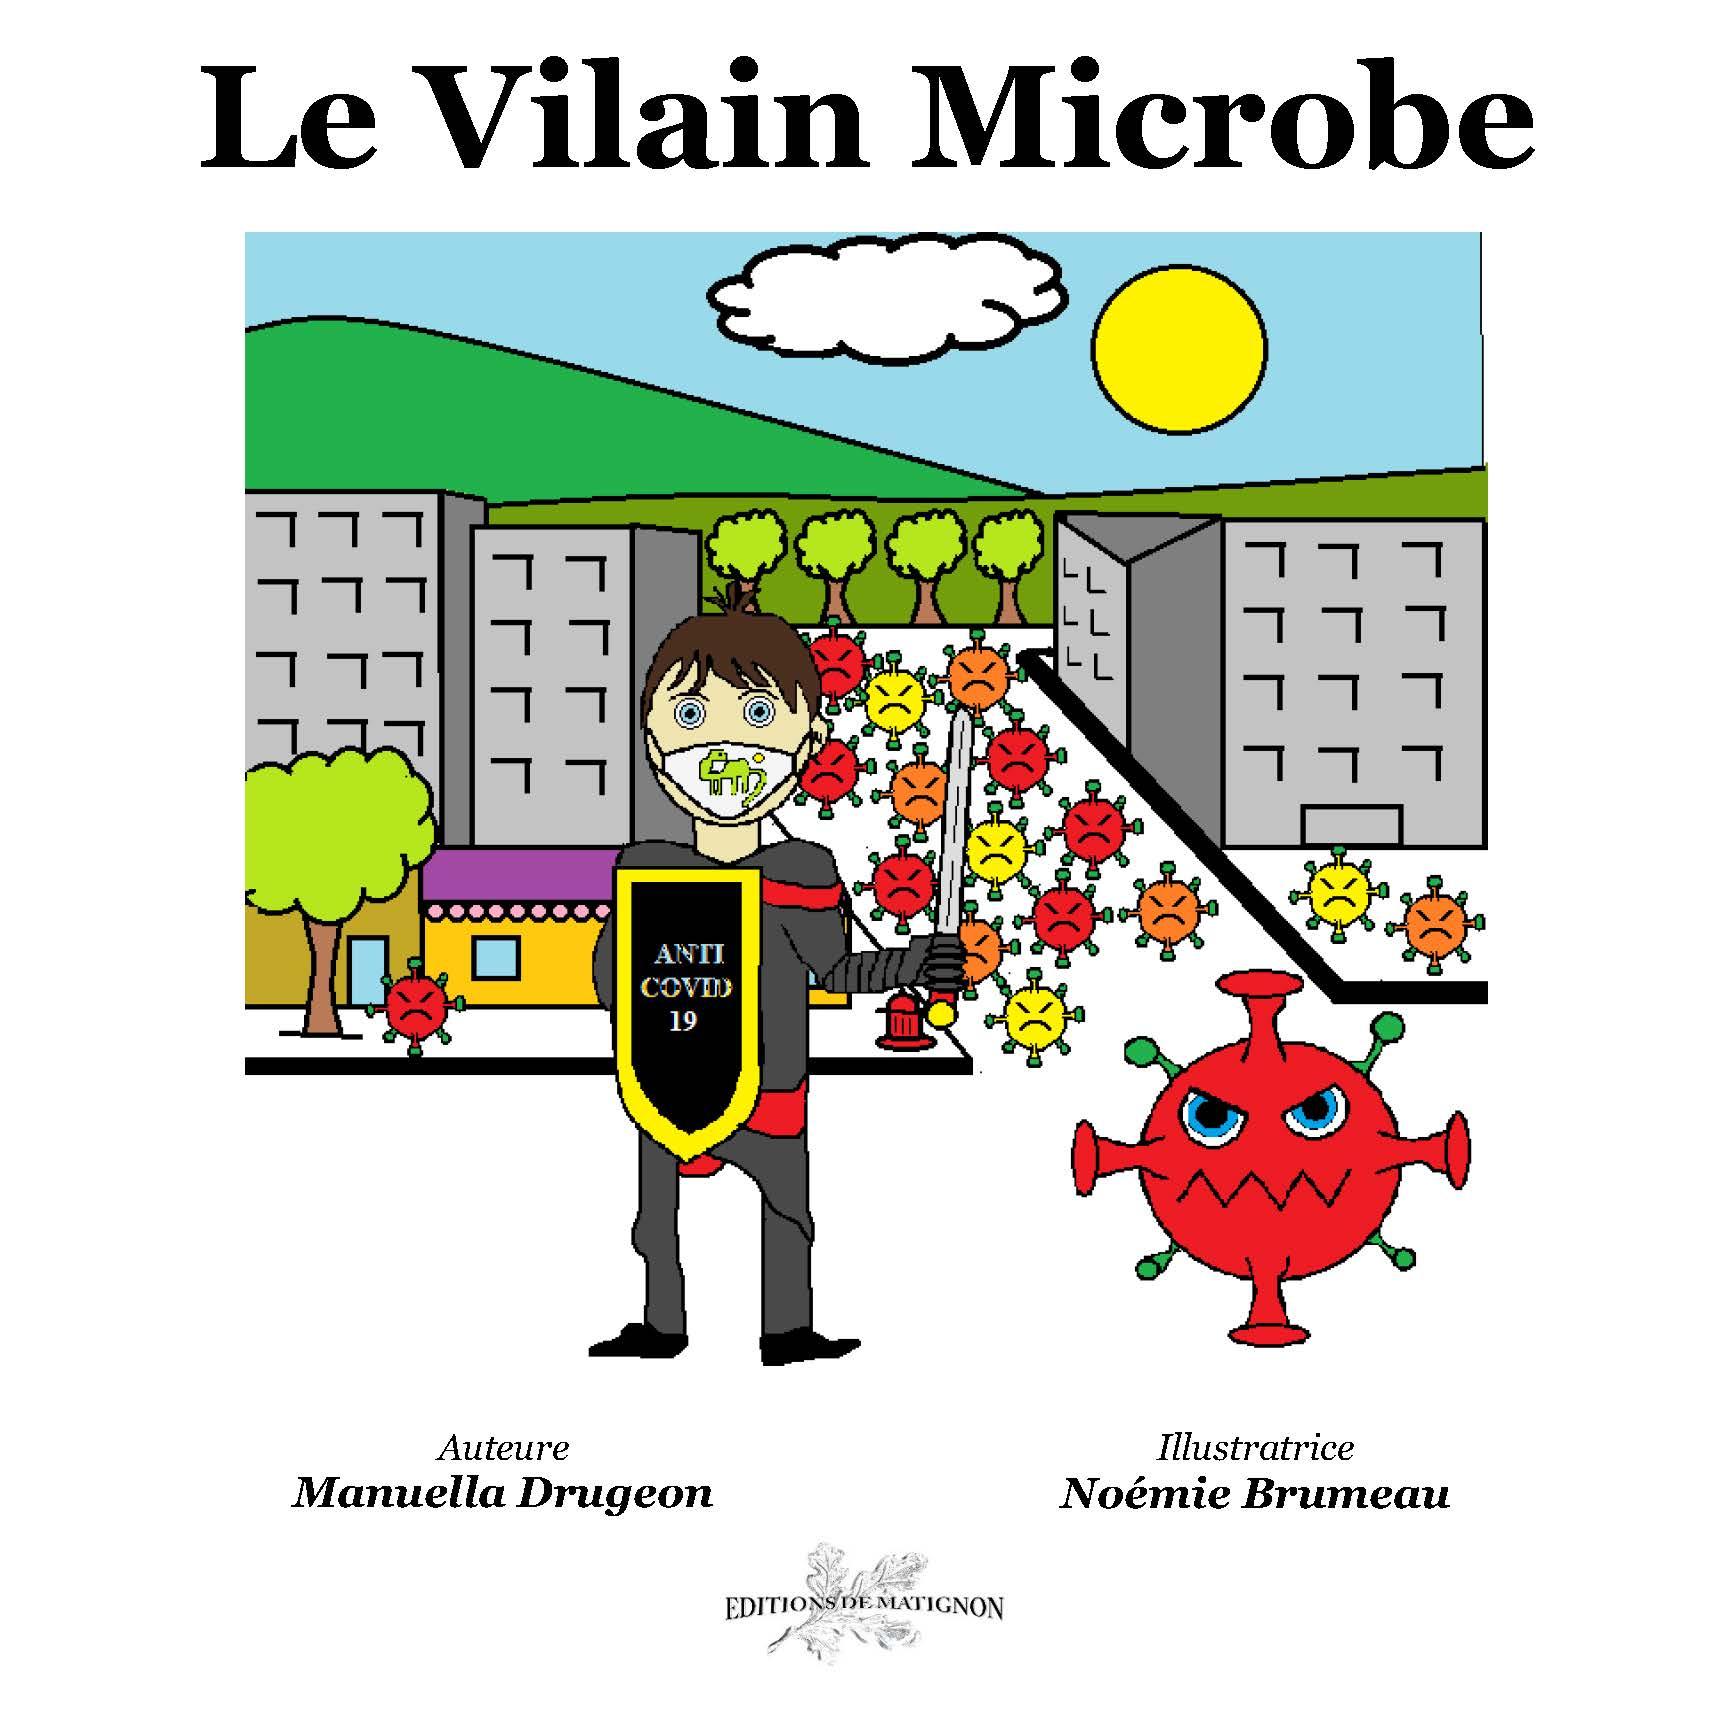 Le Vilain Microbe